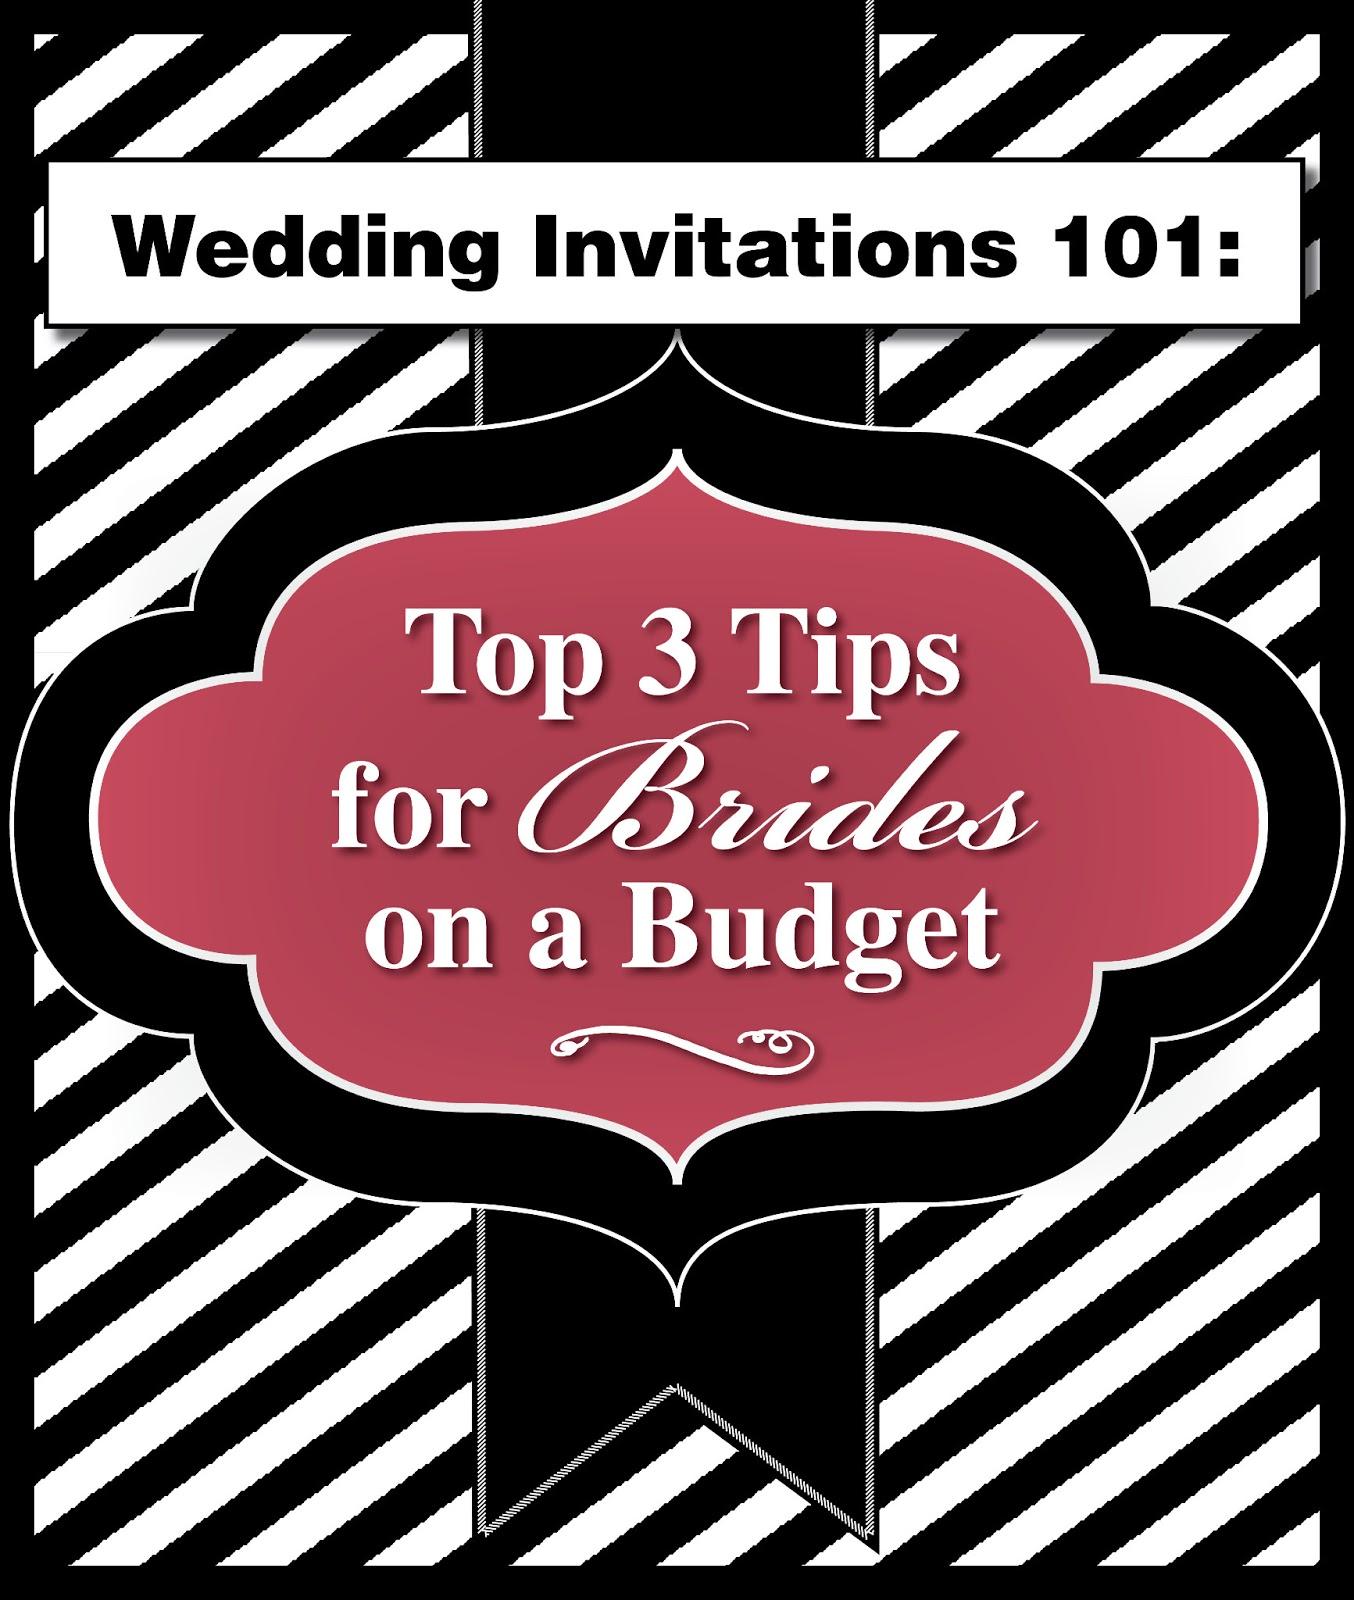 Wedding Invitation Blog: February 2013